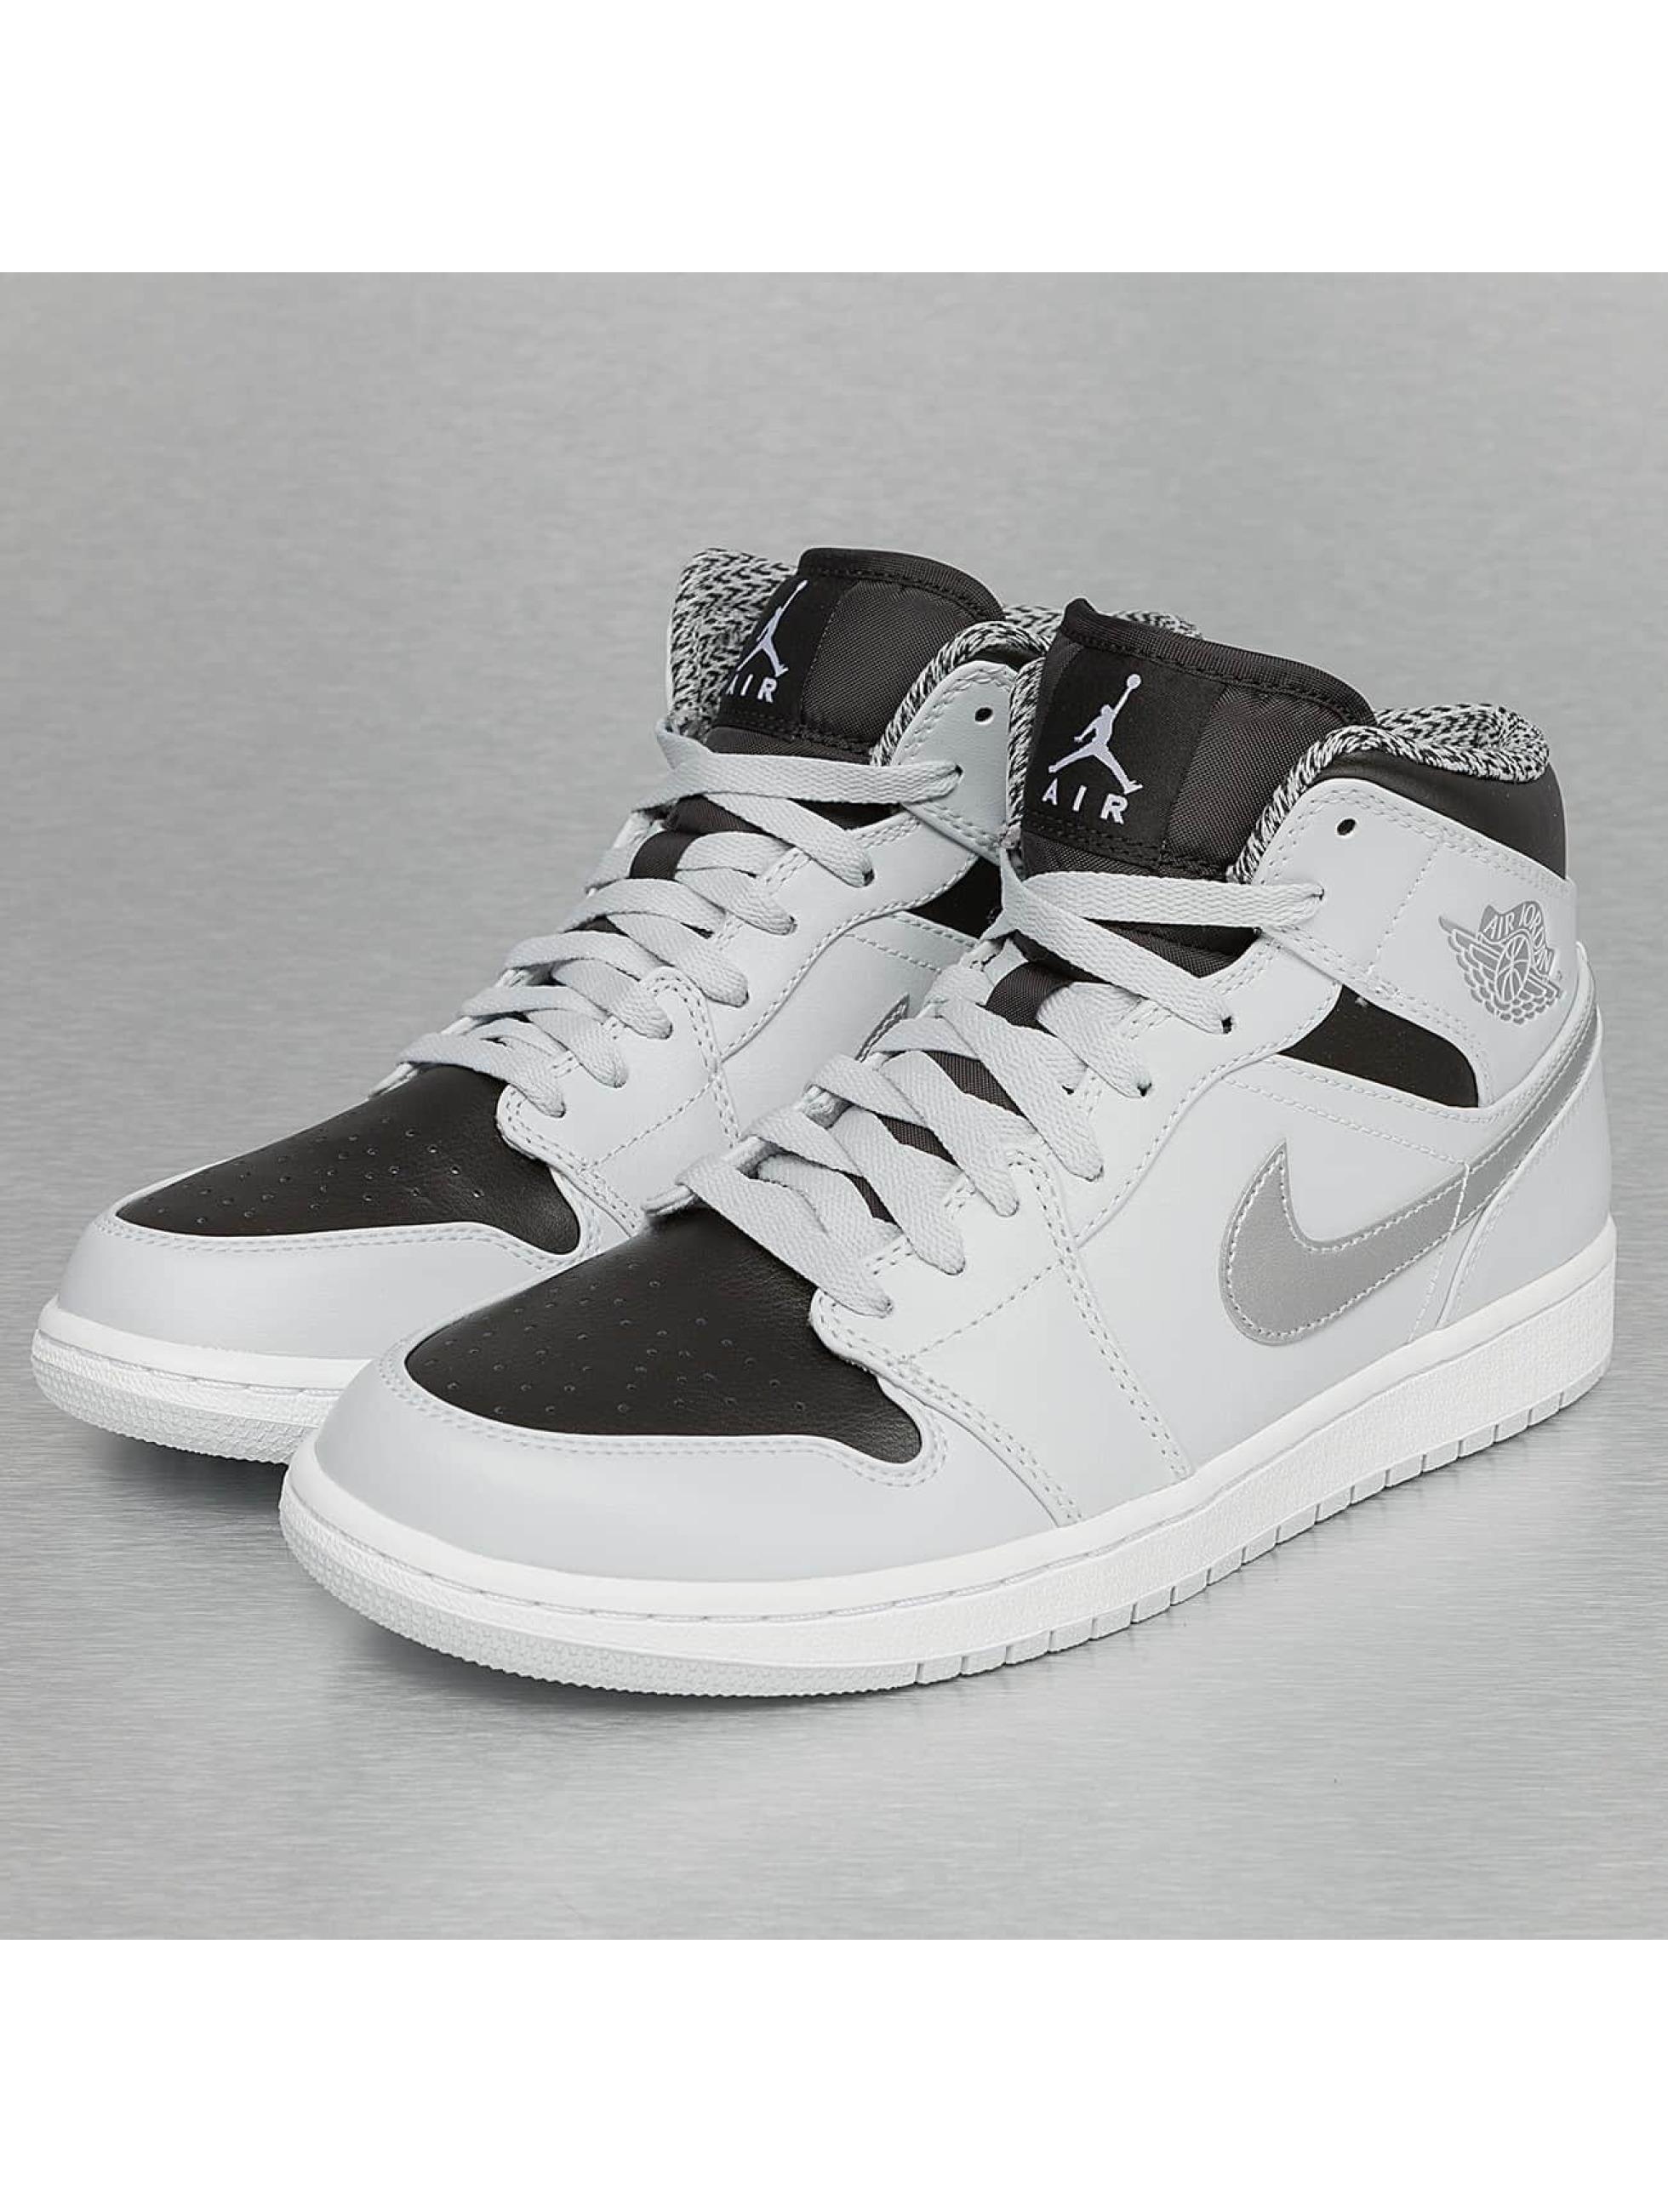 Sneaker 1 Mid in grau